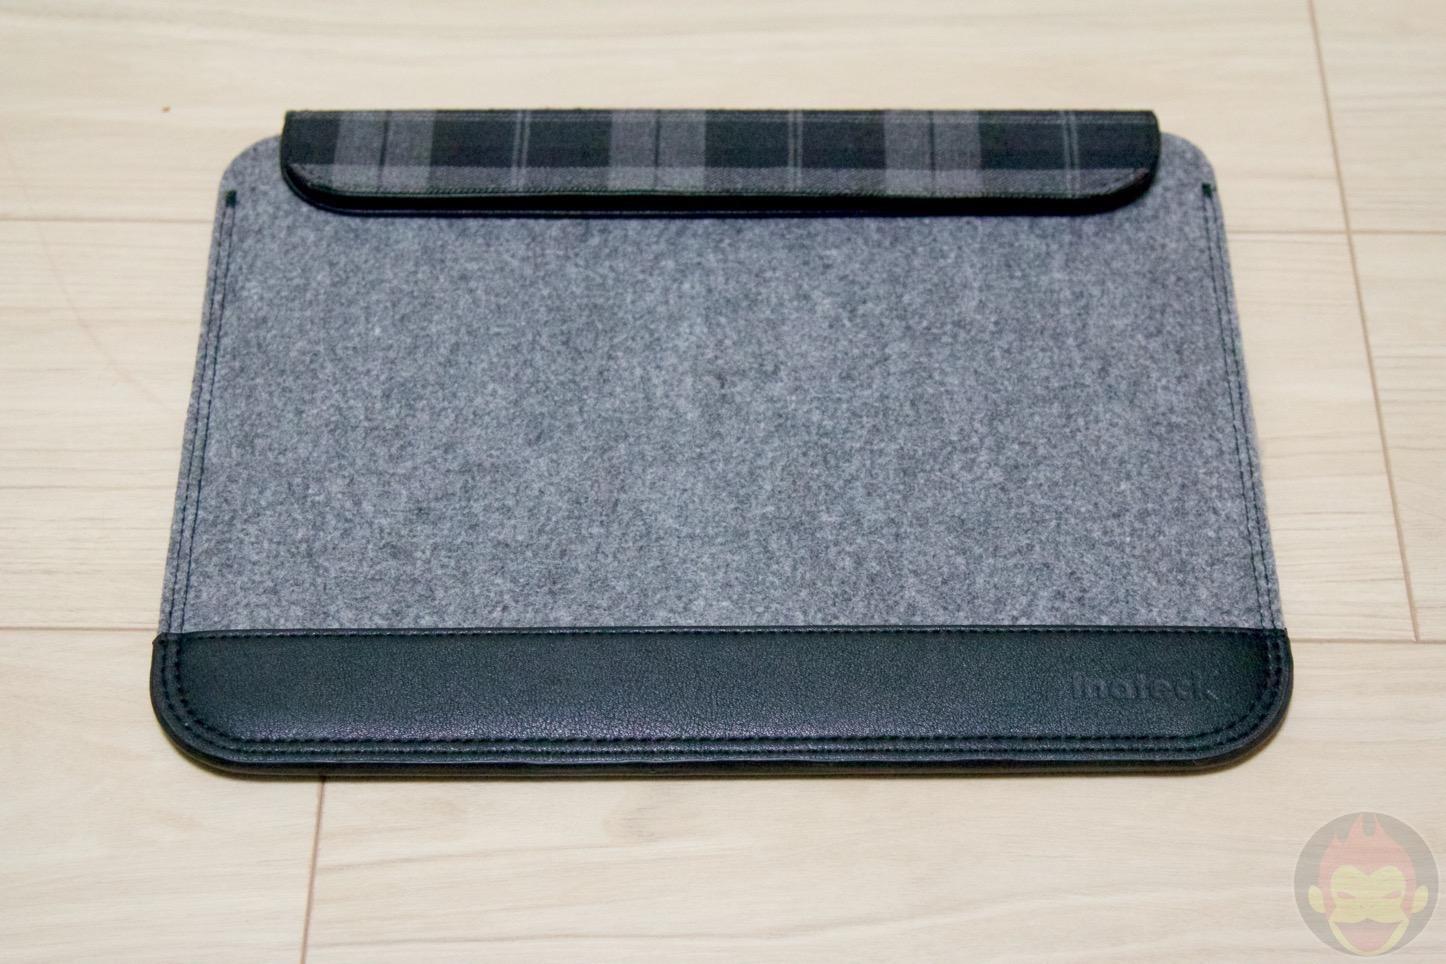 Inateck-12inch-MacBook-Case-004.jpg